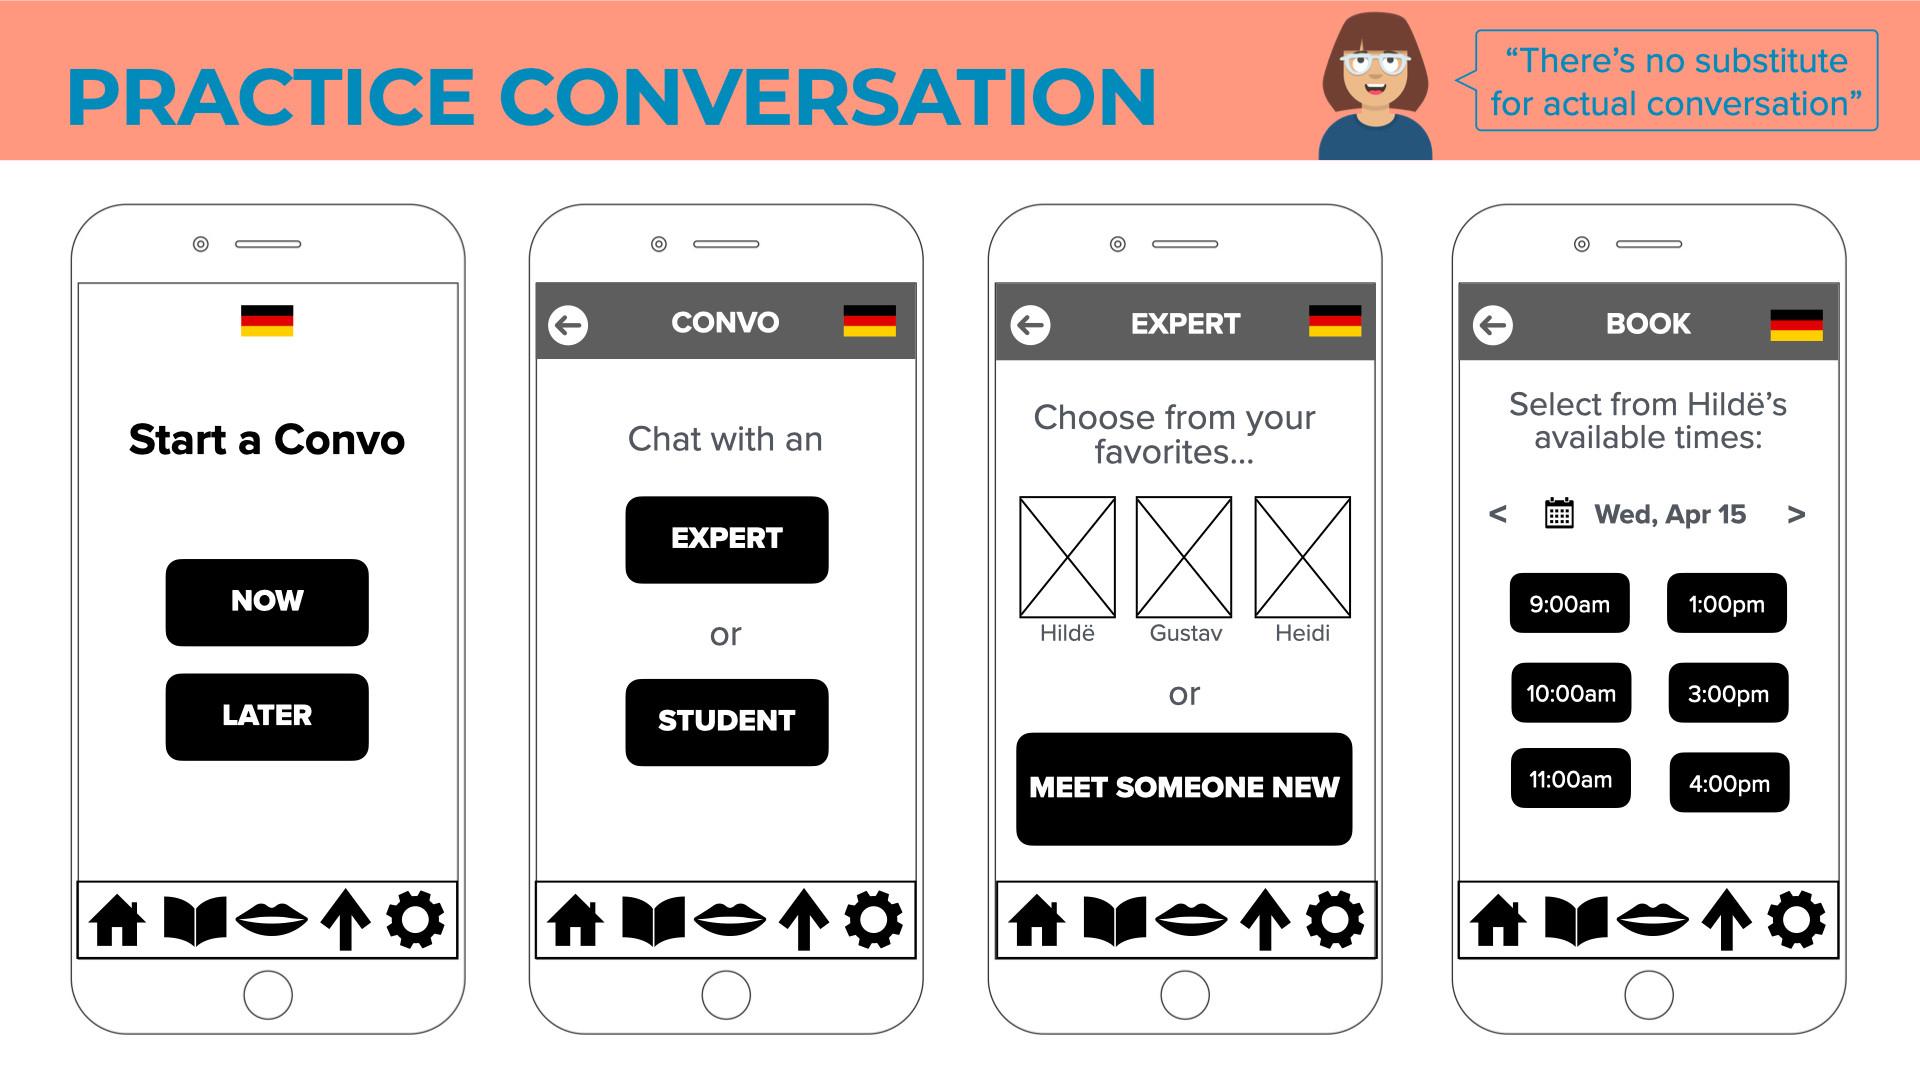 Practice Conversation